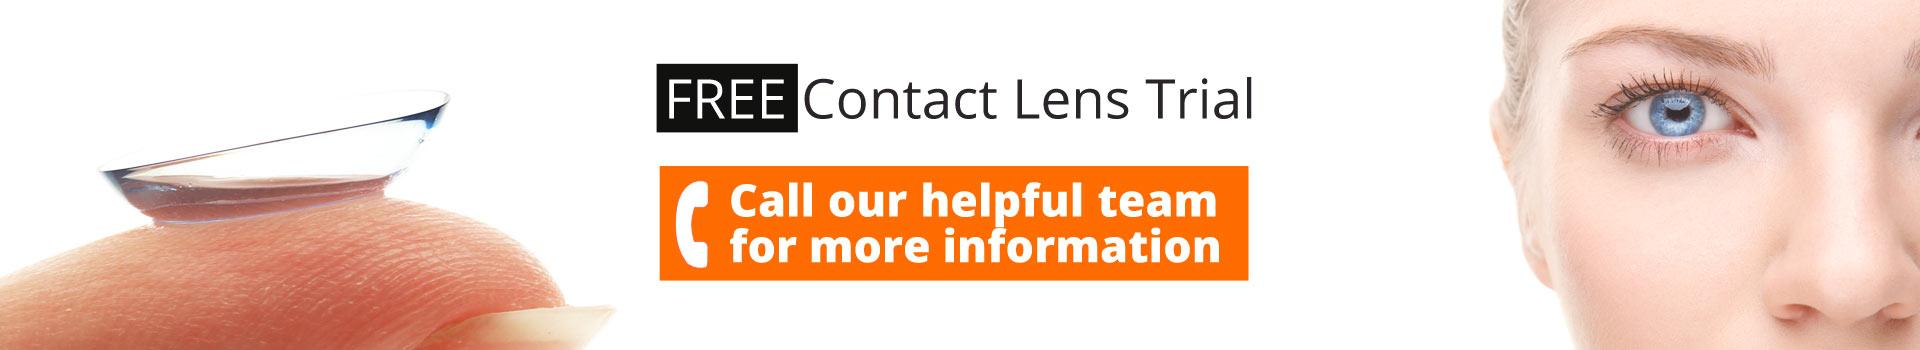 ContactLensFreeTrial151